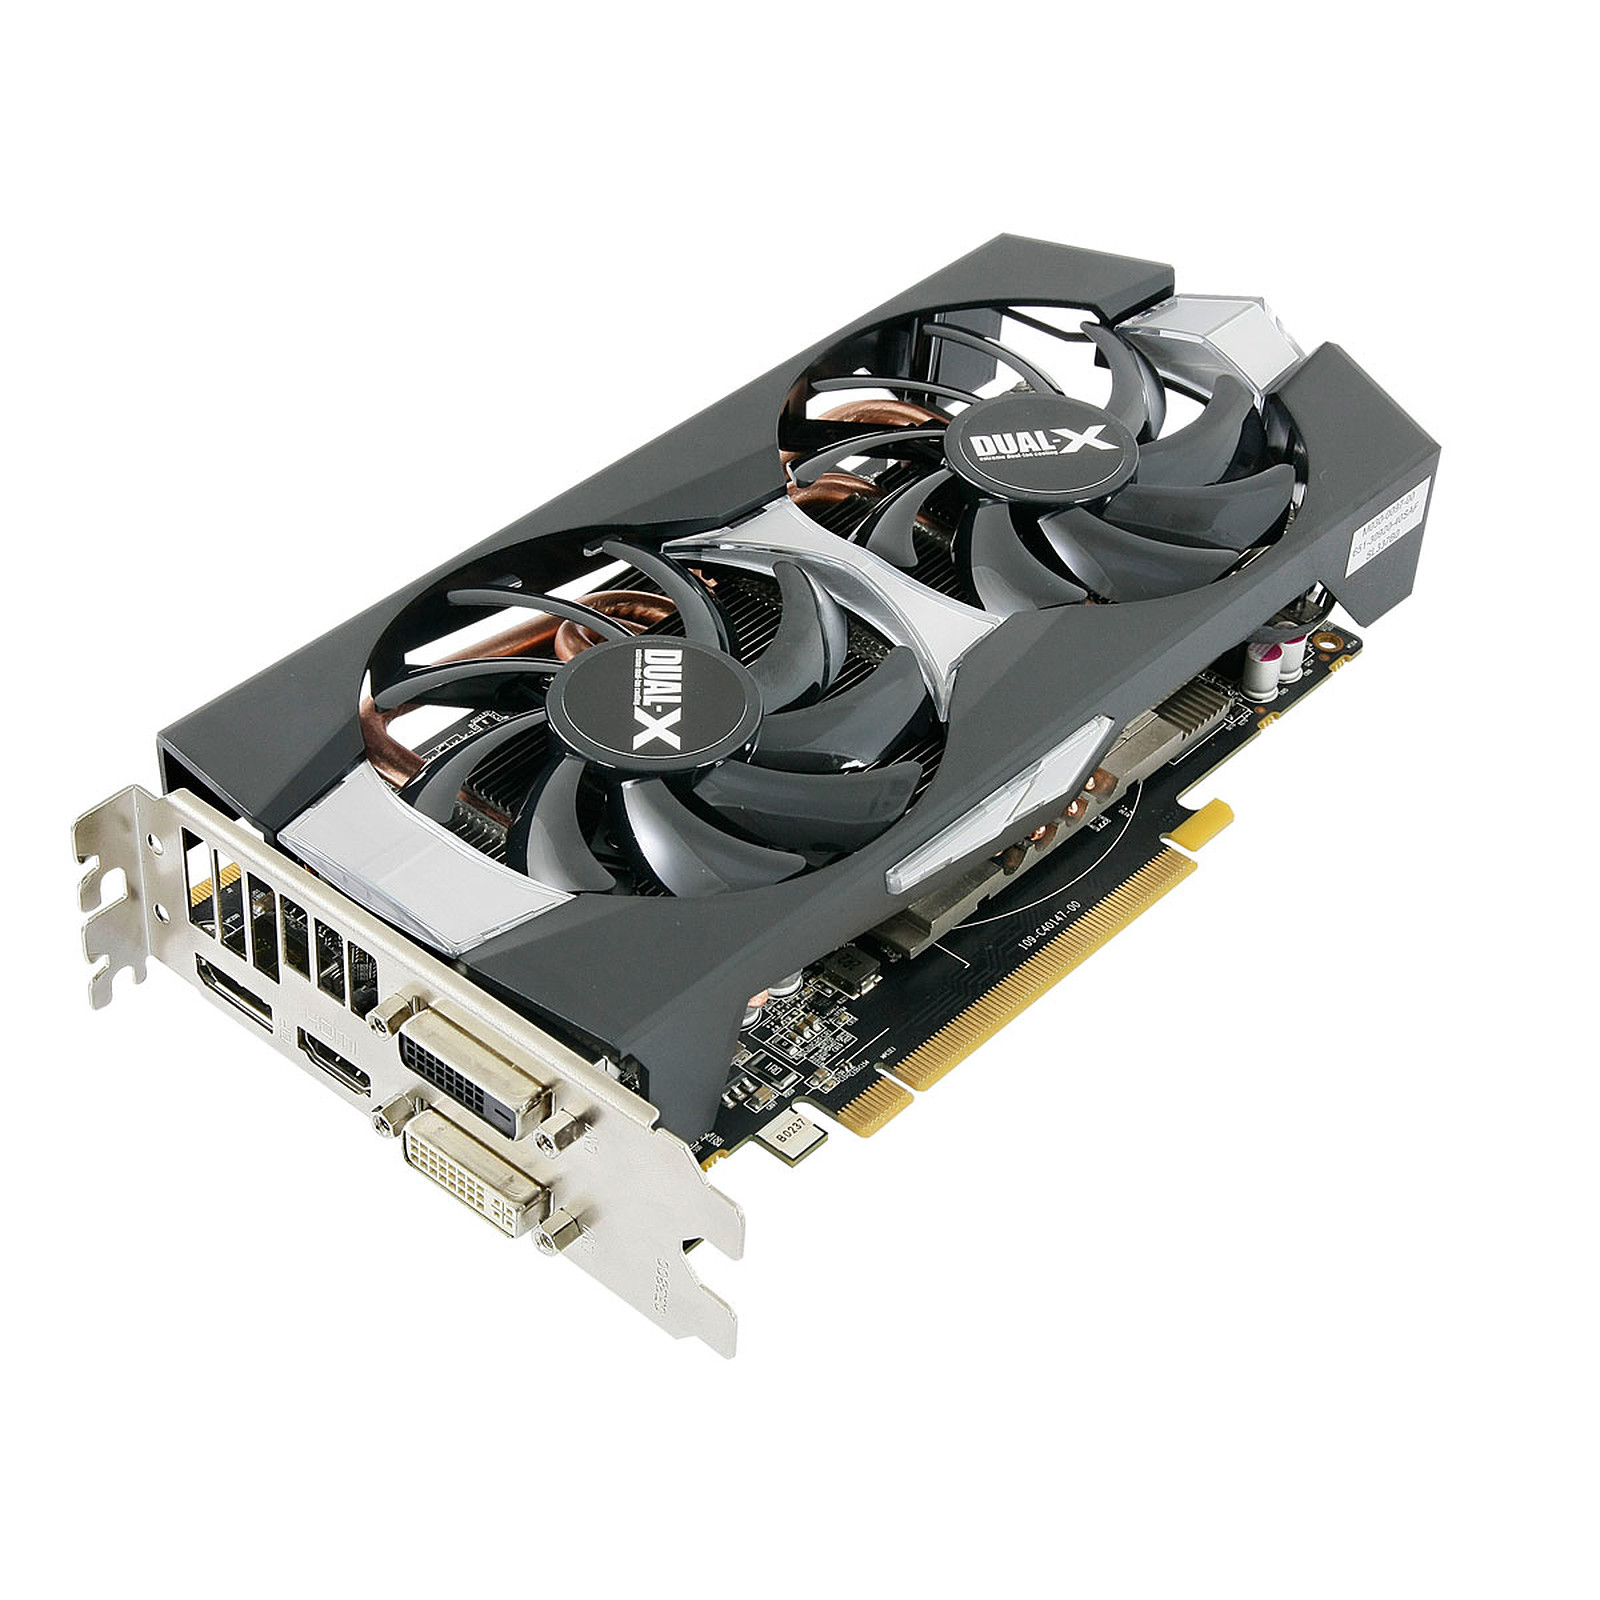 Sapphire Radeon R9 270X Dual-X 2G GDDR5 OC